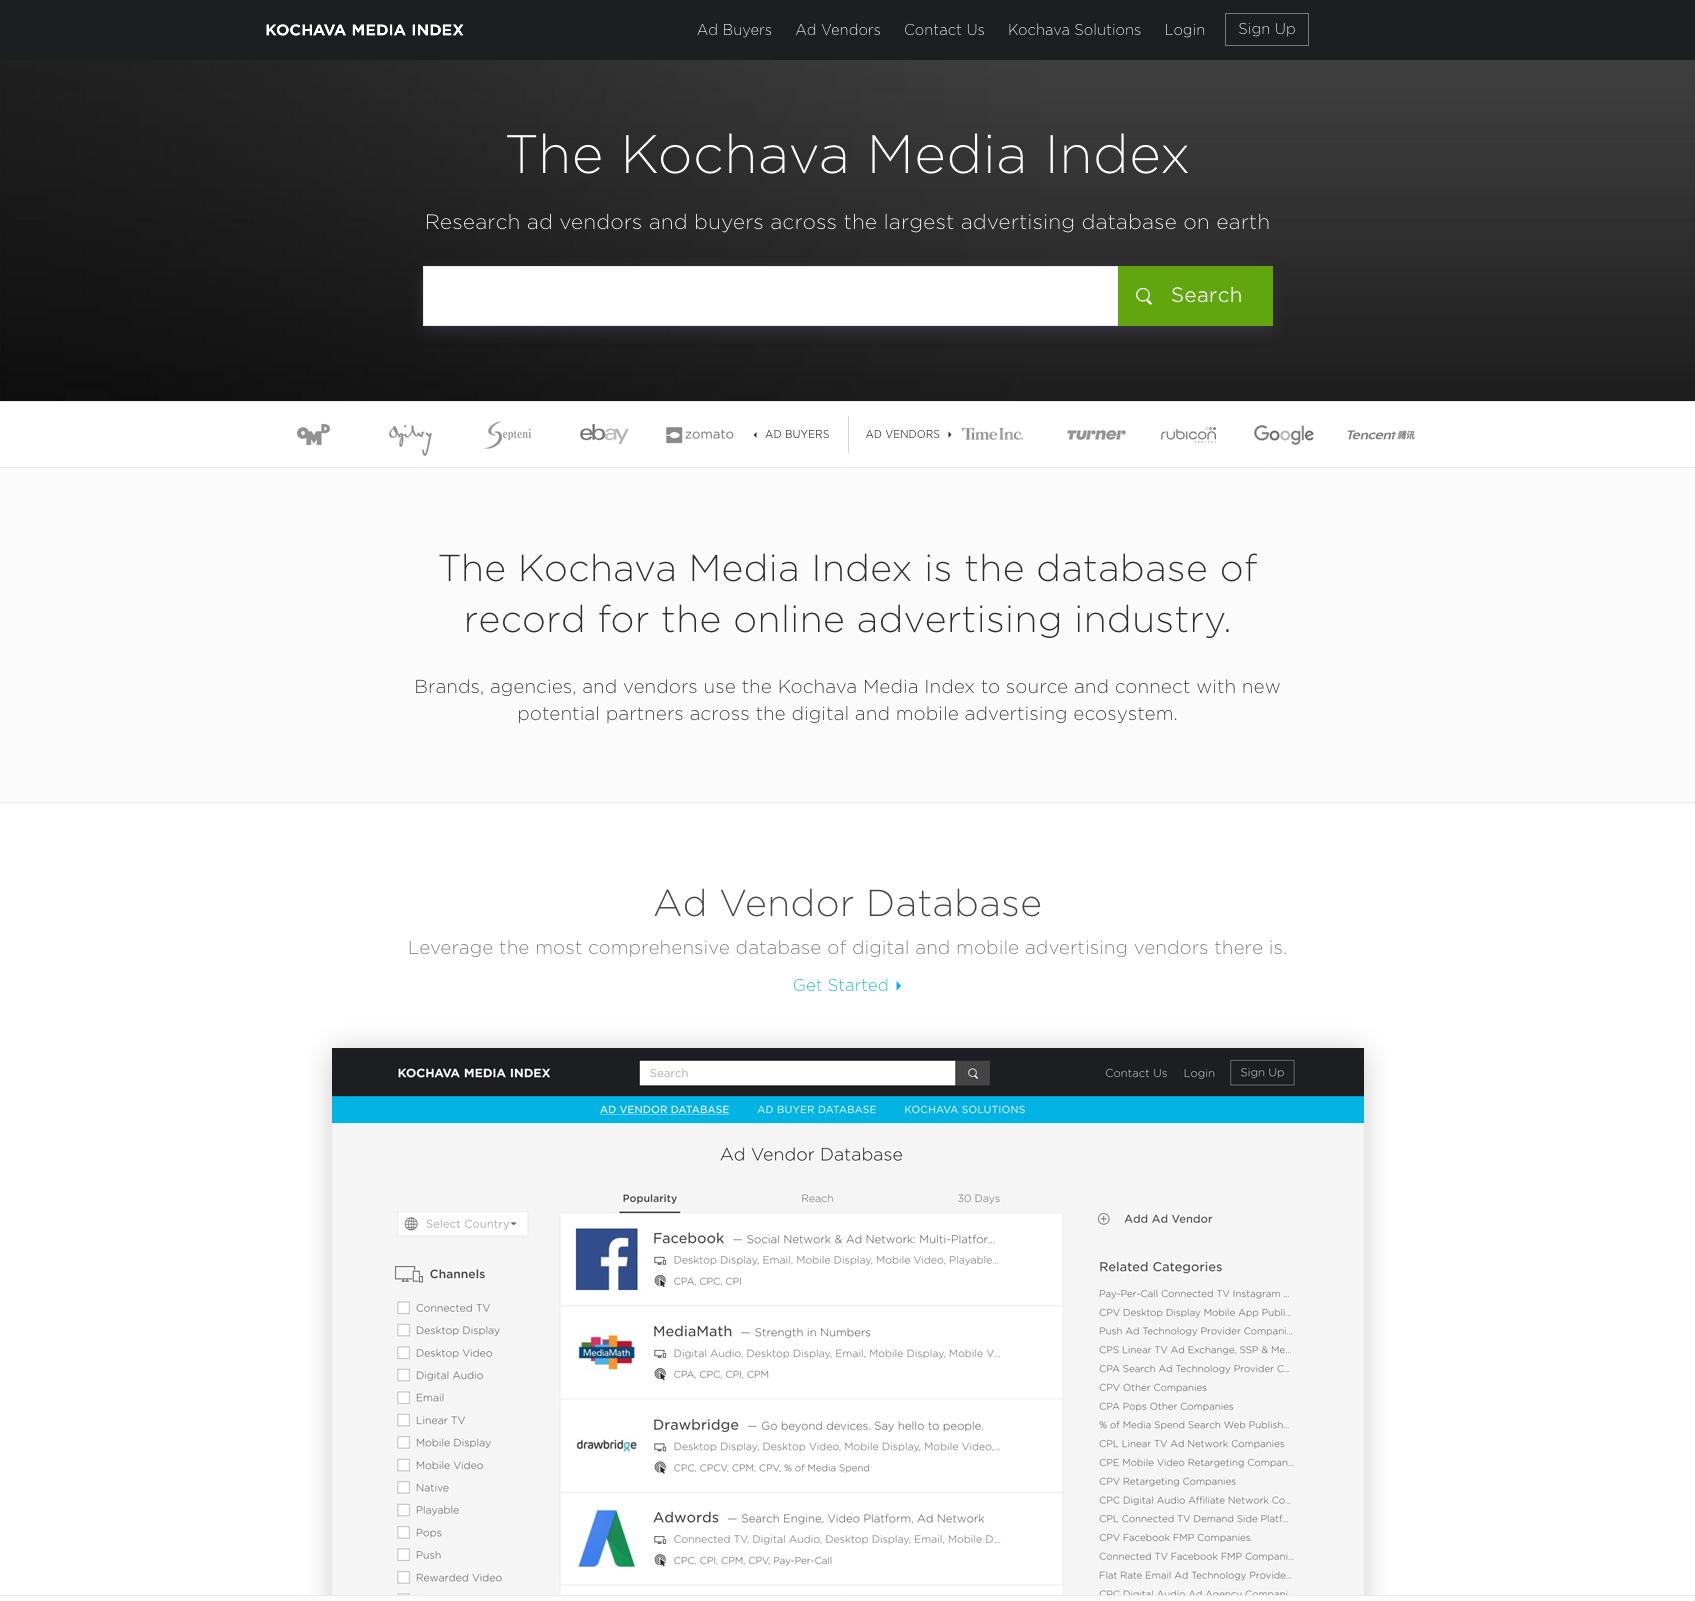 Kochava Media Index advertising database